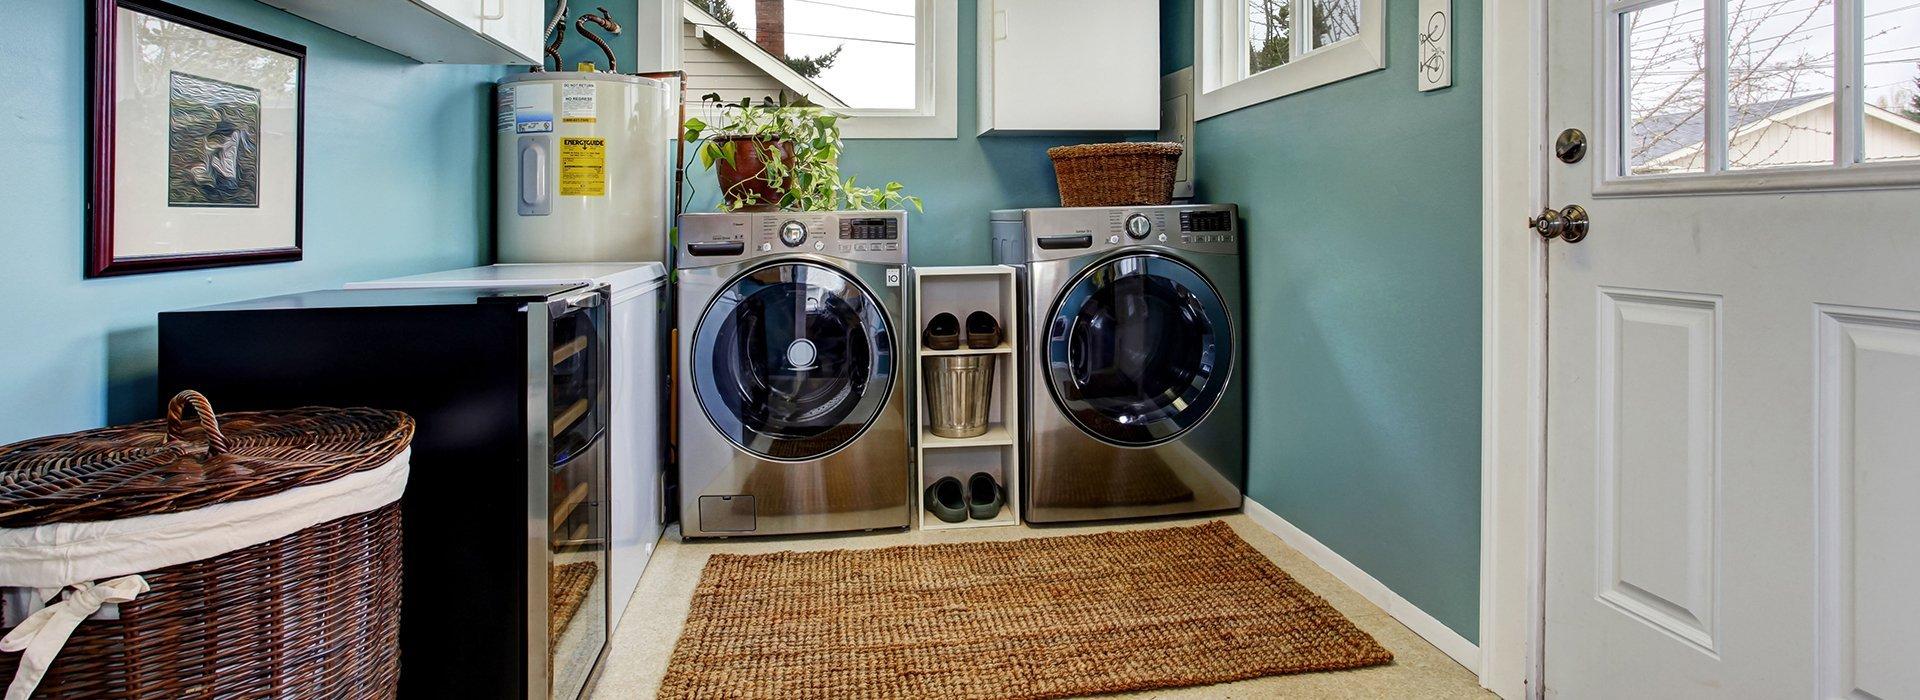 Richie S L I Appliance Home Service Center Inc Hicksville Ny